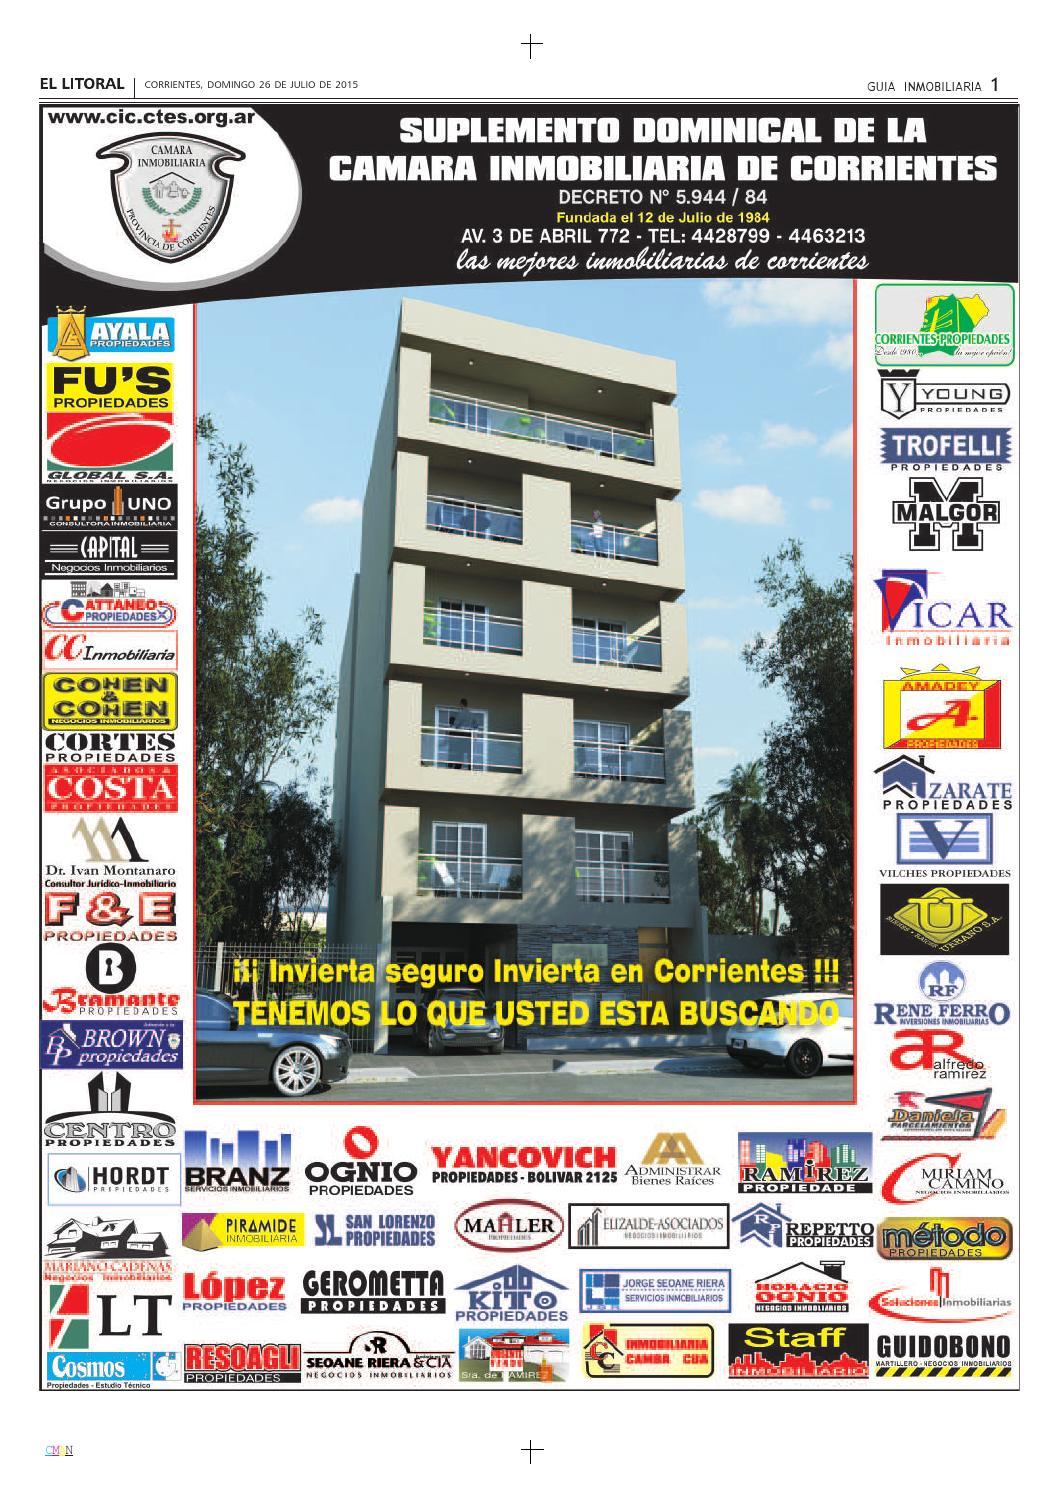 C mara inmobiliaria 26 07 2015 by diario el litoral issuu for Guia inmobiliaria